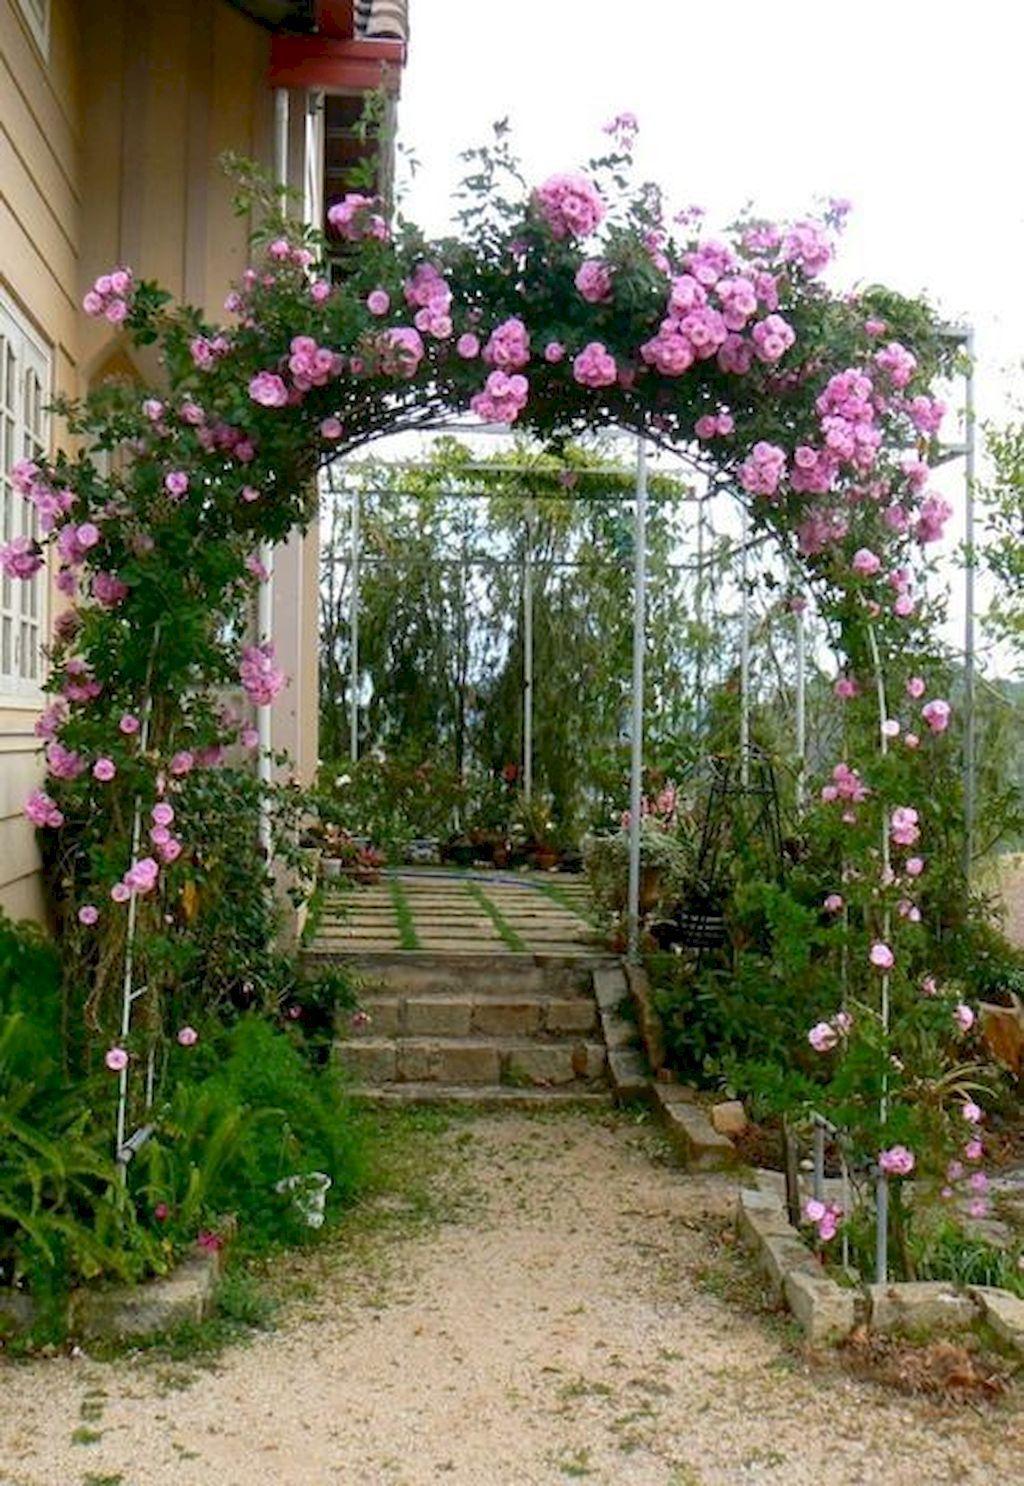 Gorgeous 80 Affordable Backyard Vegetable Garden Design Ideas Https Homespecially Com 80 Affordable Ba Rose Garden Design Vegetable Garden Design Garden Arch